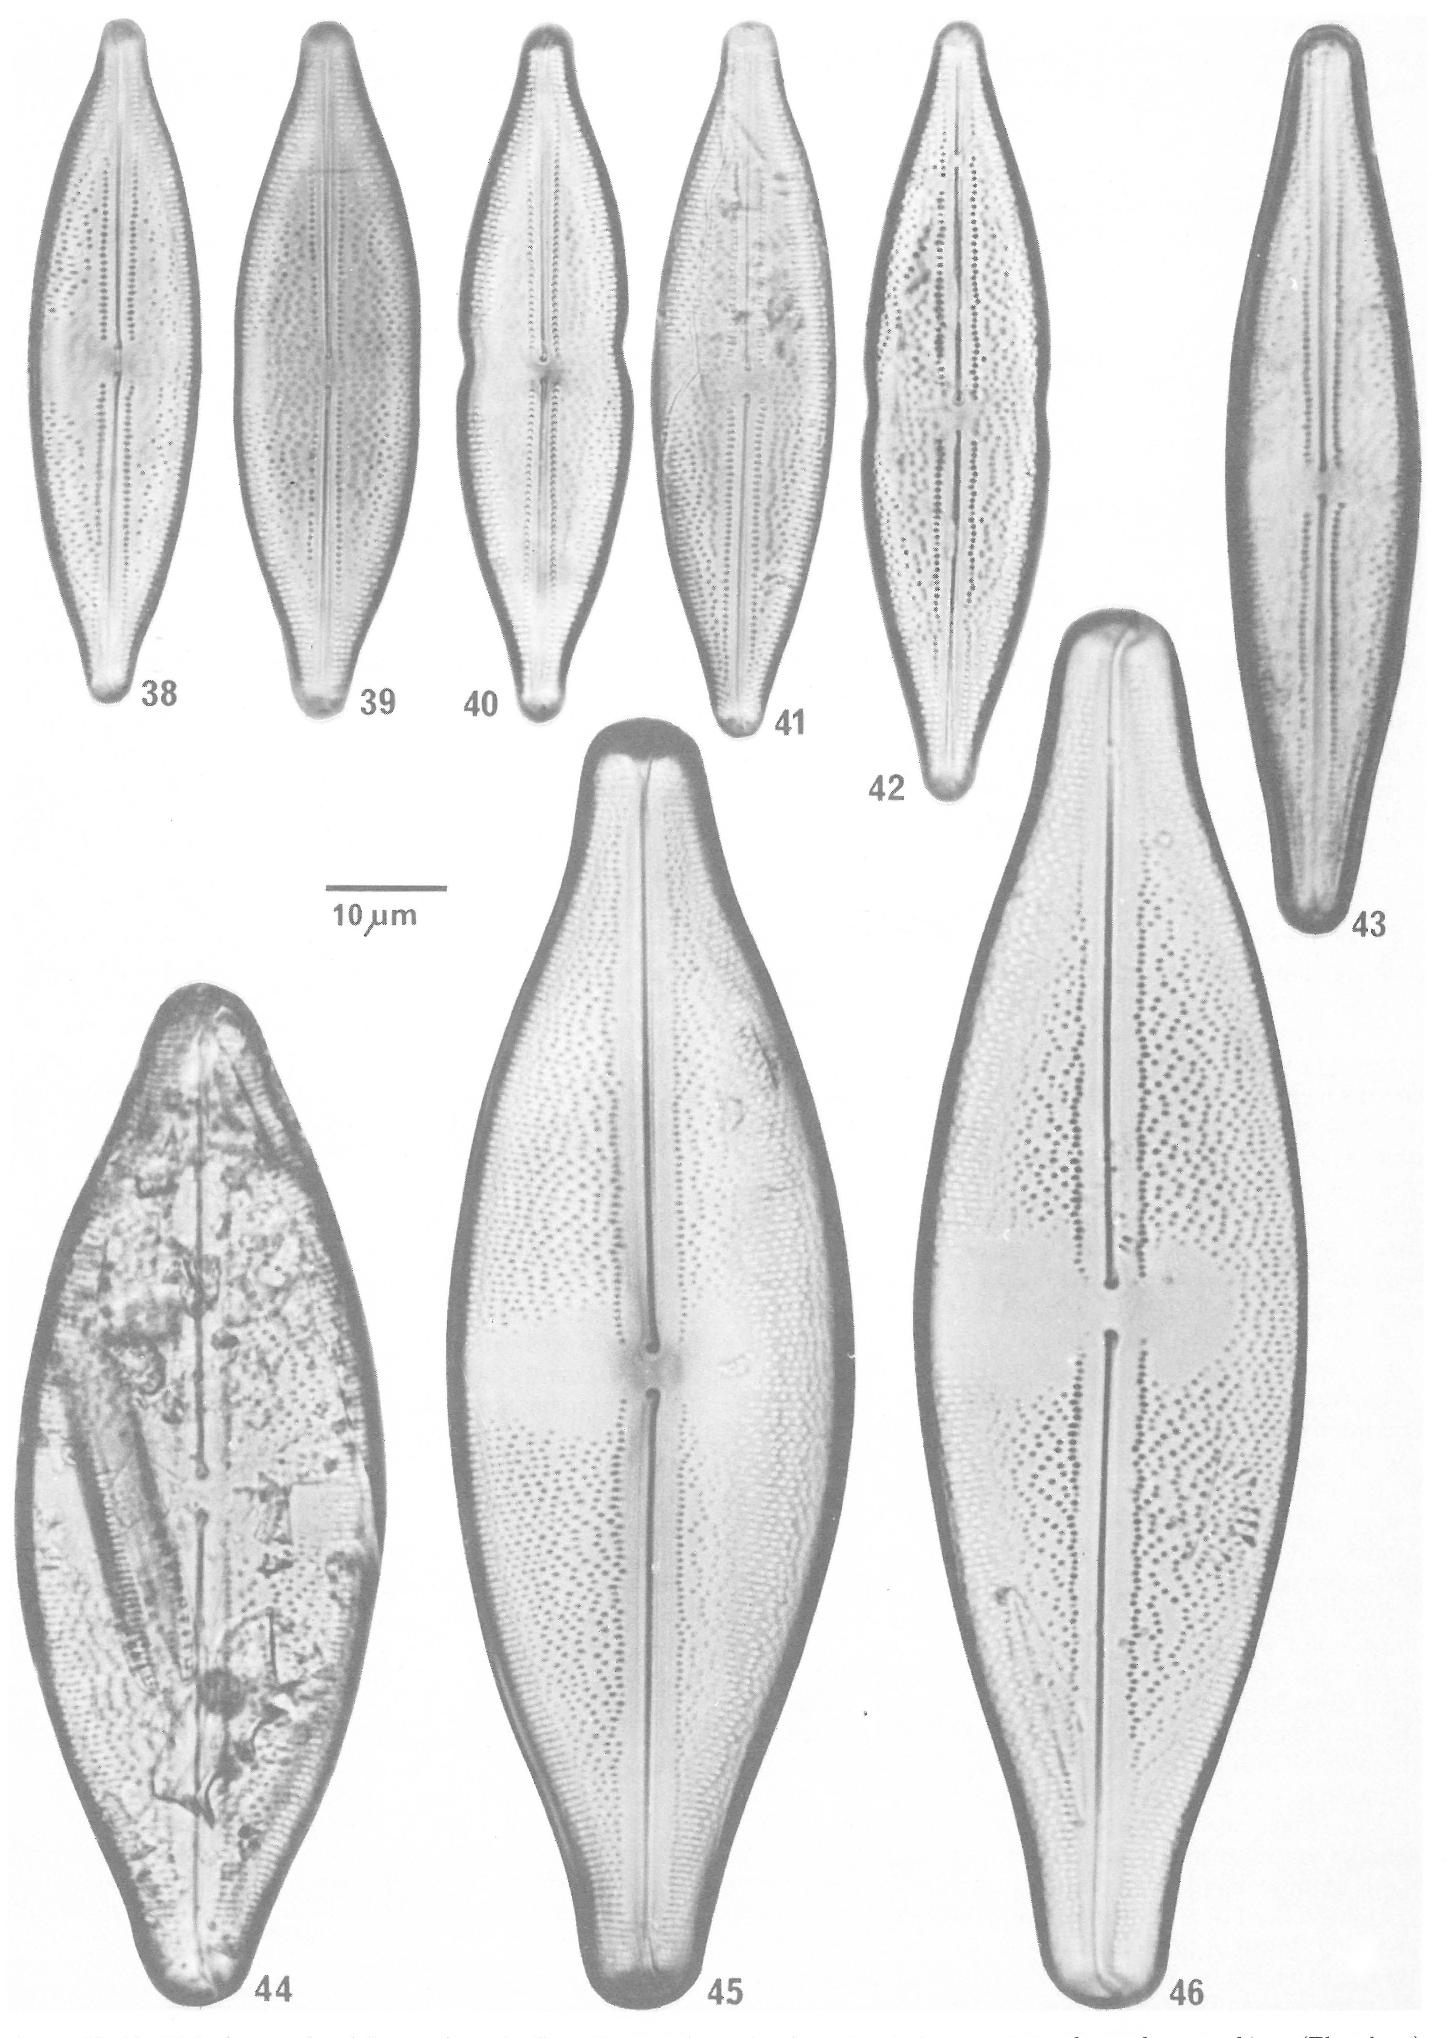 figure 38-46